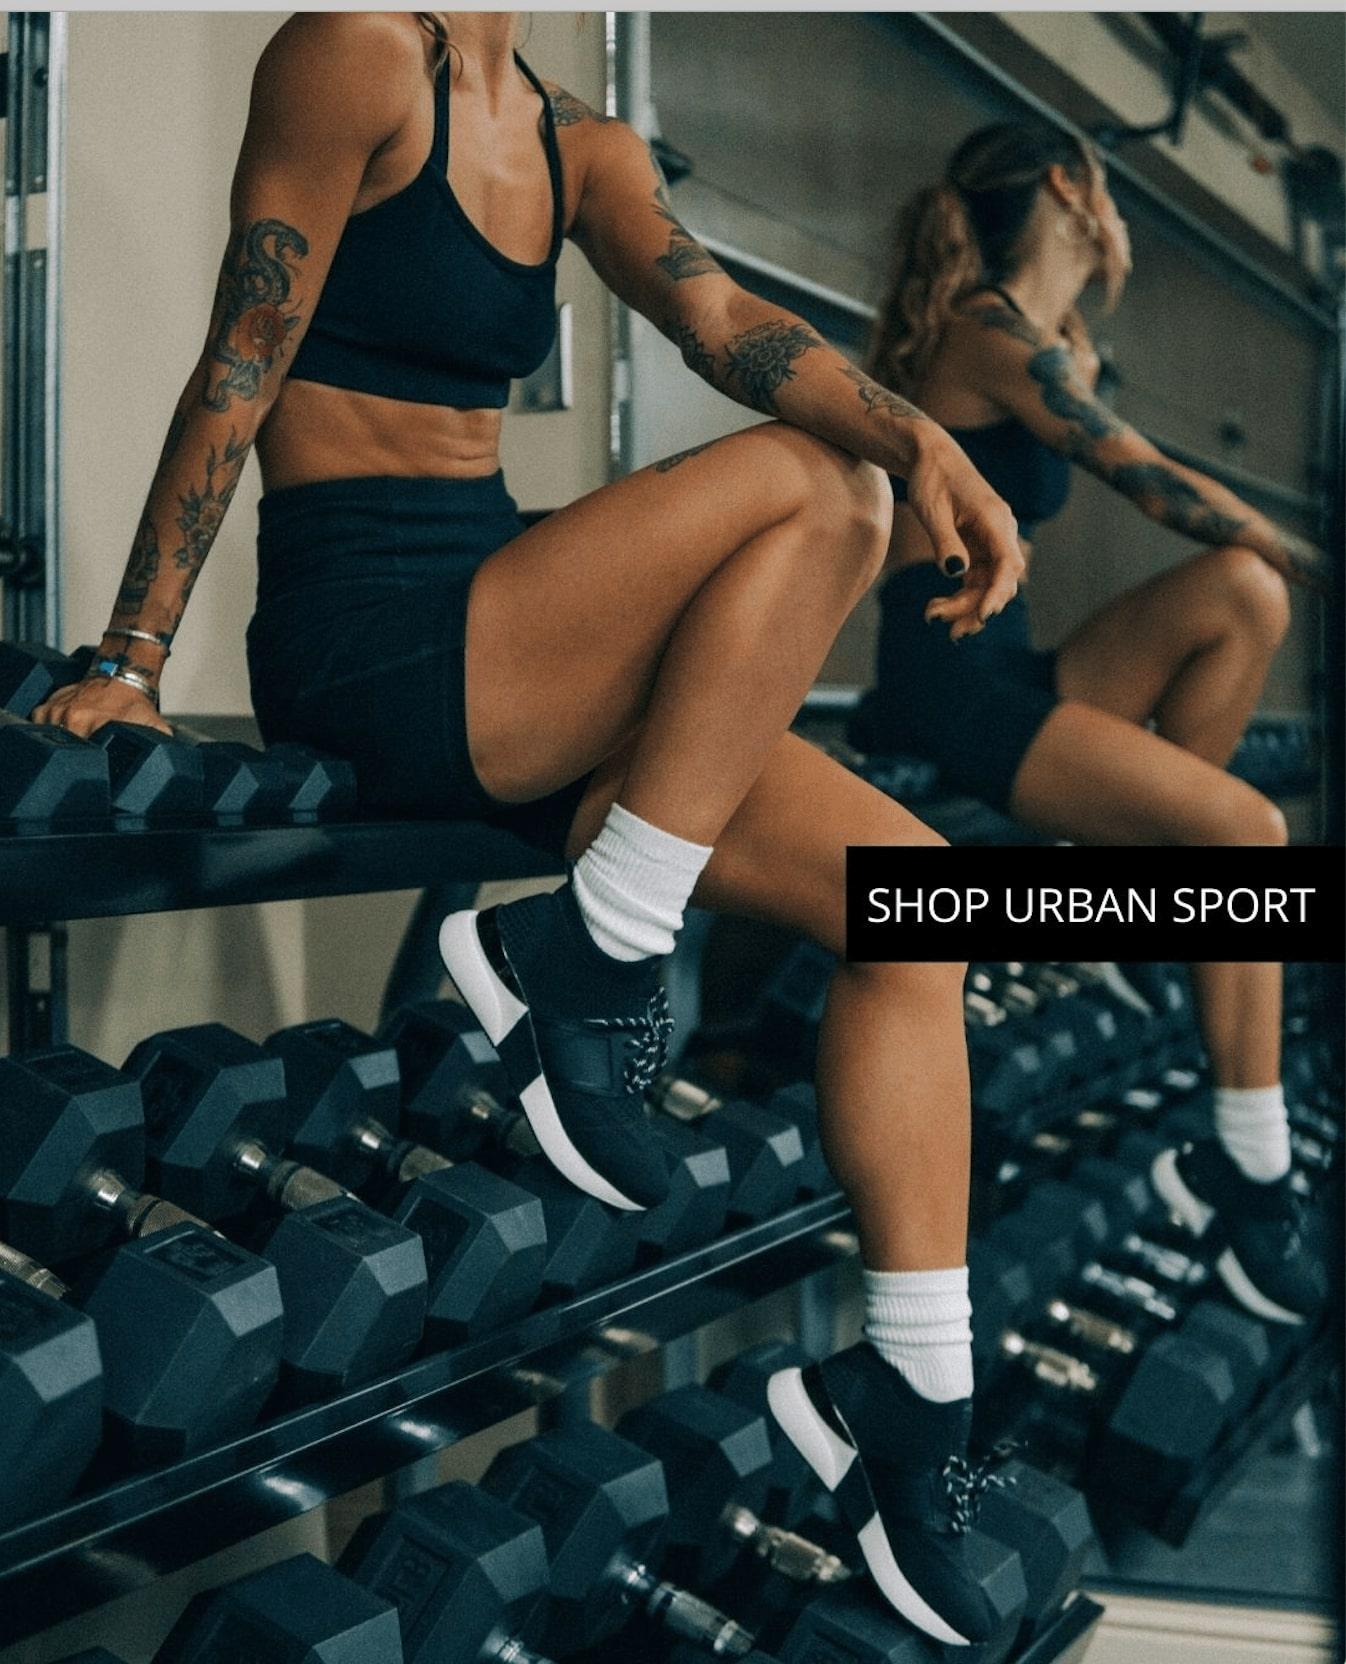 Shop Urban Sport